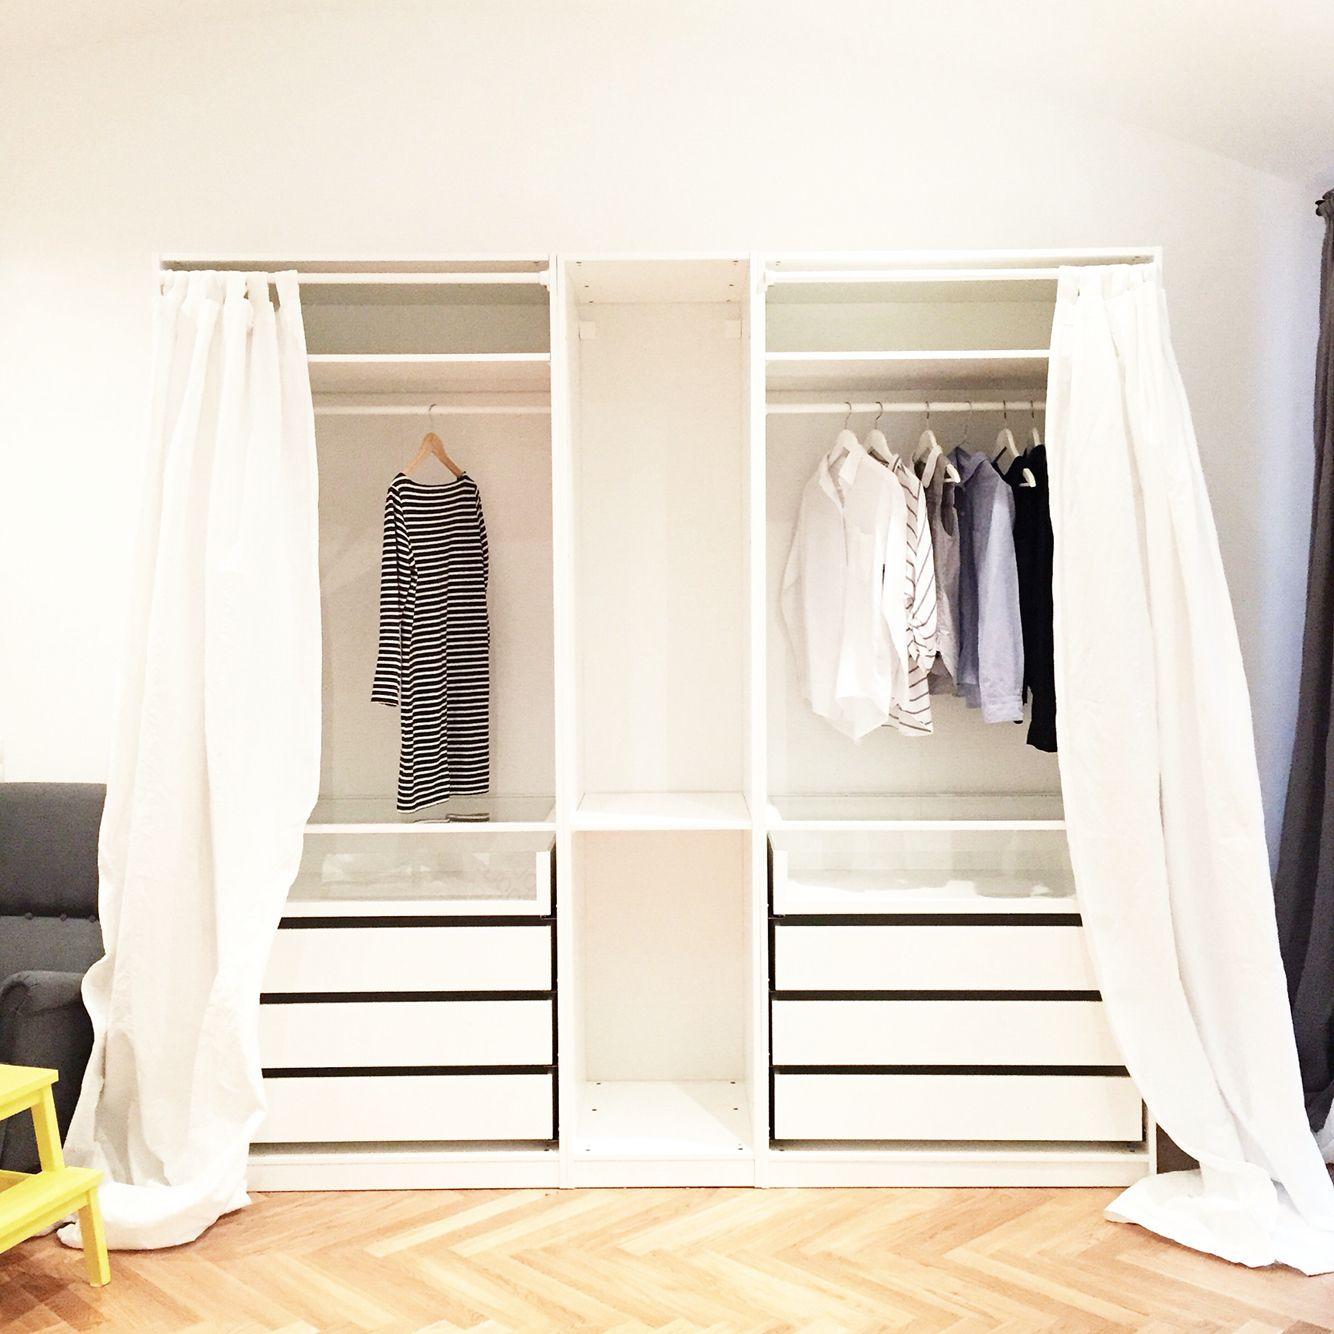 empty ikea pax closet 2016 renovation pinterest ikea pax closet. Black Bedroom Furniture Sets. Home Design Ideas